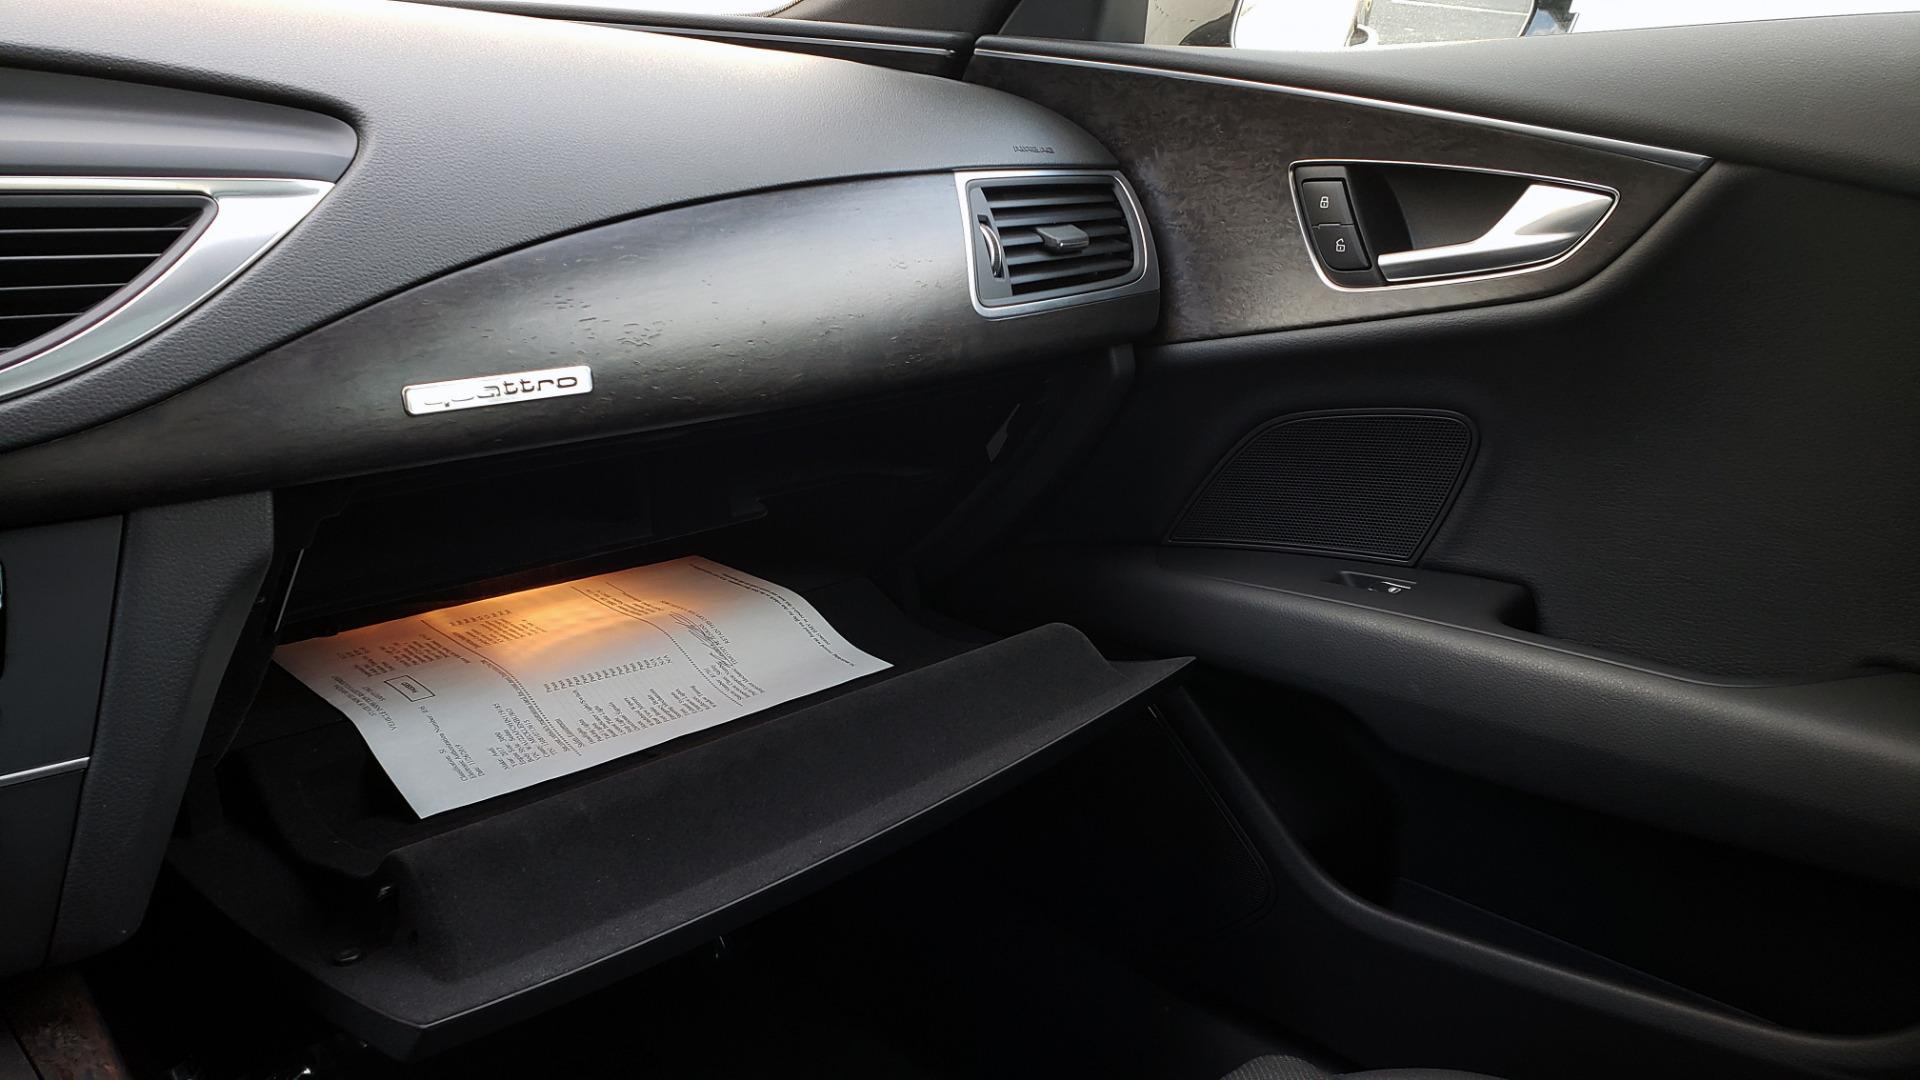 Used 2017 Audi A7 PRESTIGE / DRVR ASST / S-LINE SPORT / NAV / REARVIEW for sale Sold at Formula Imports in Charlotte NC 28227 52